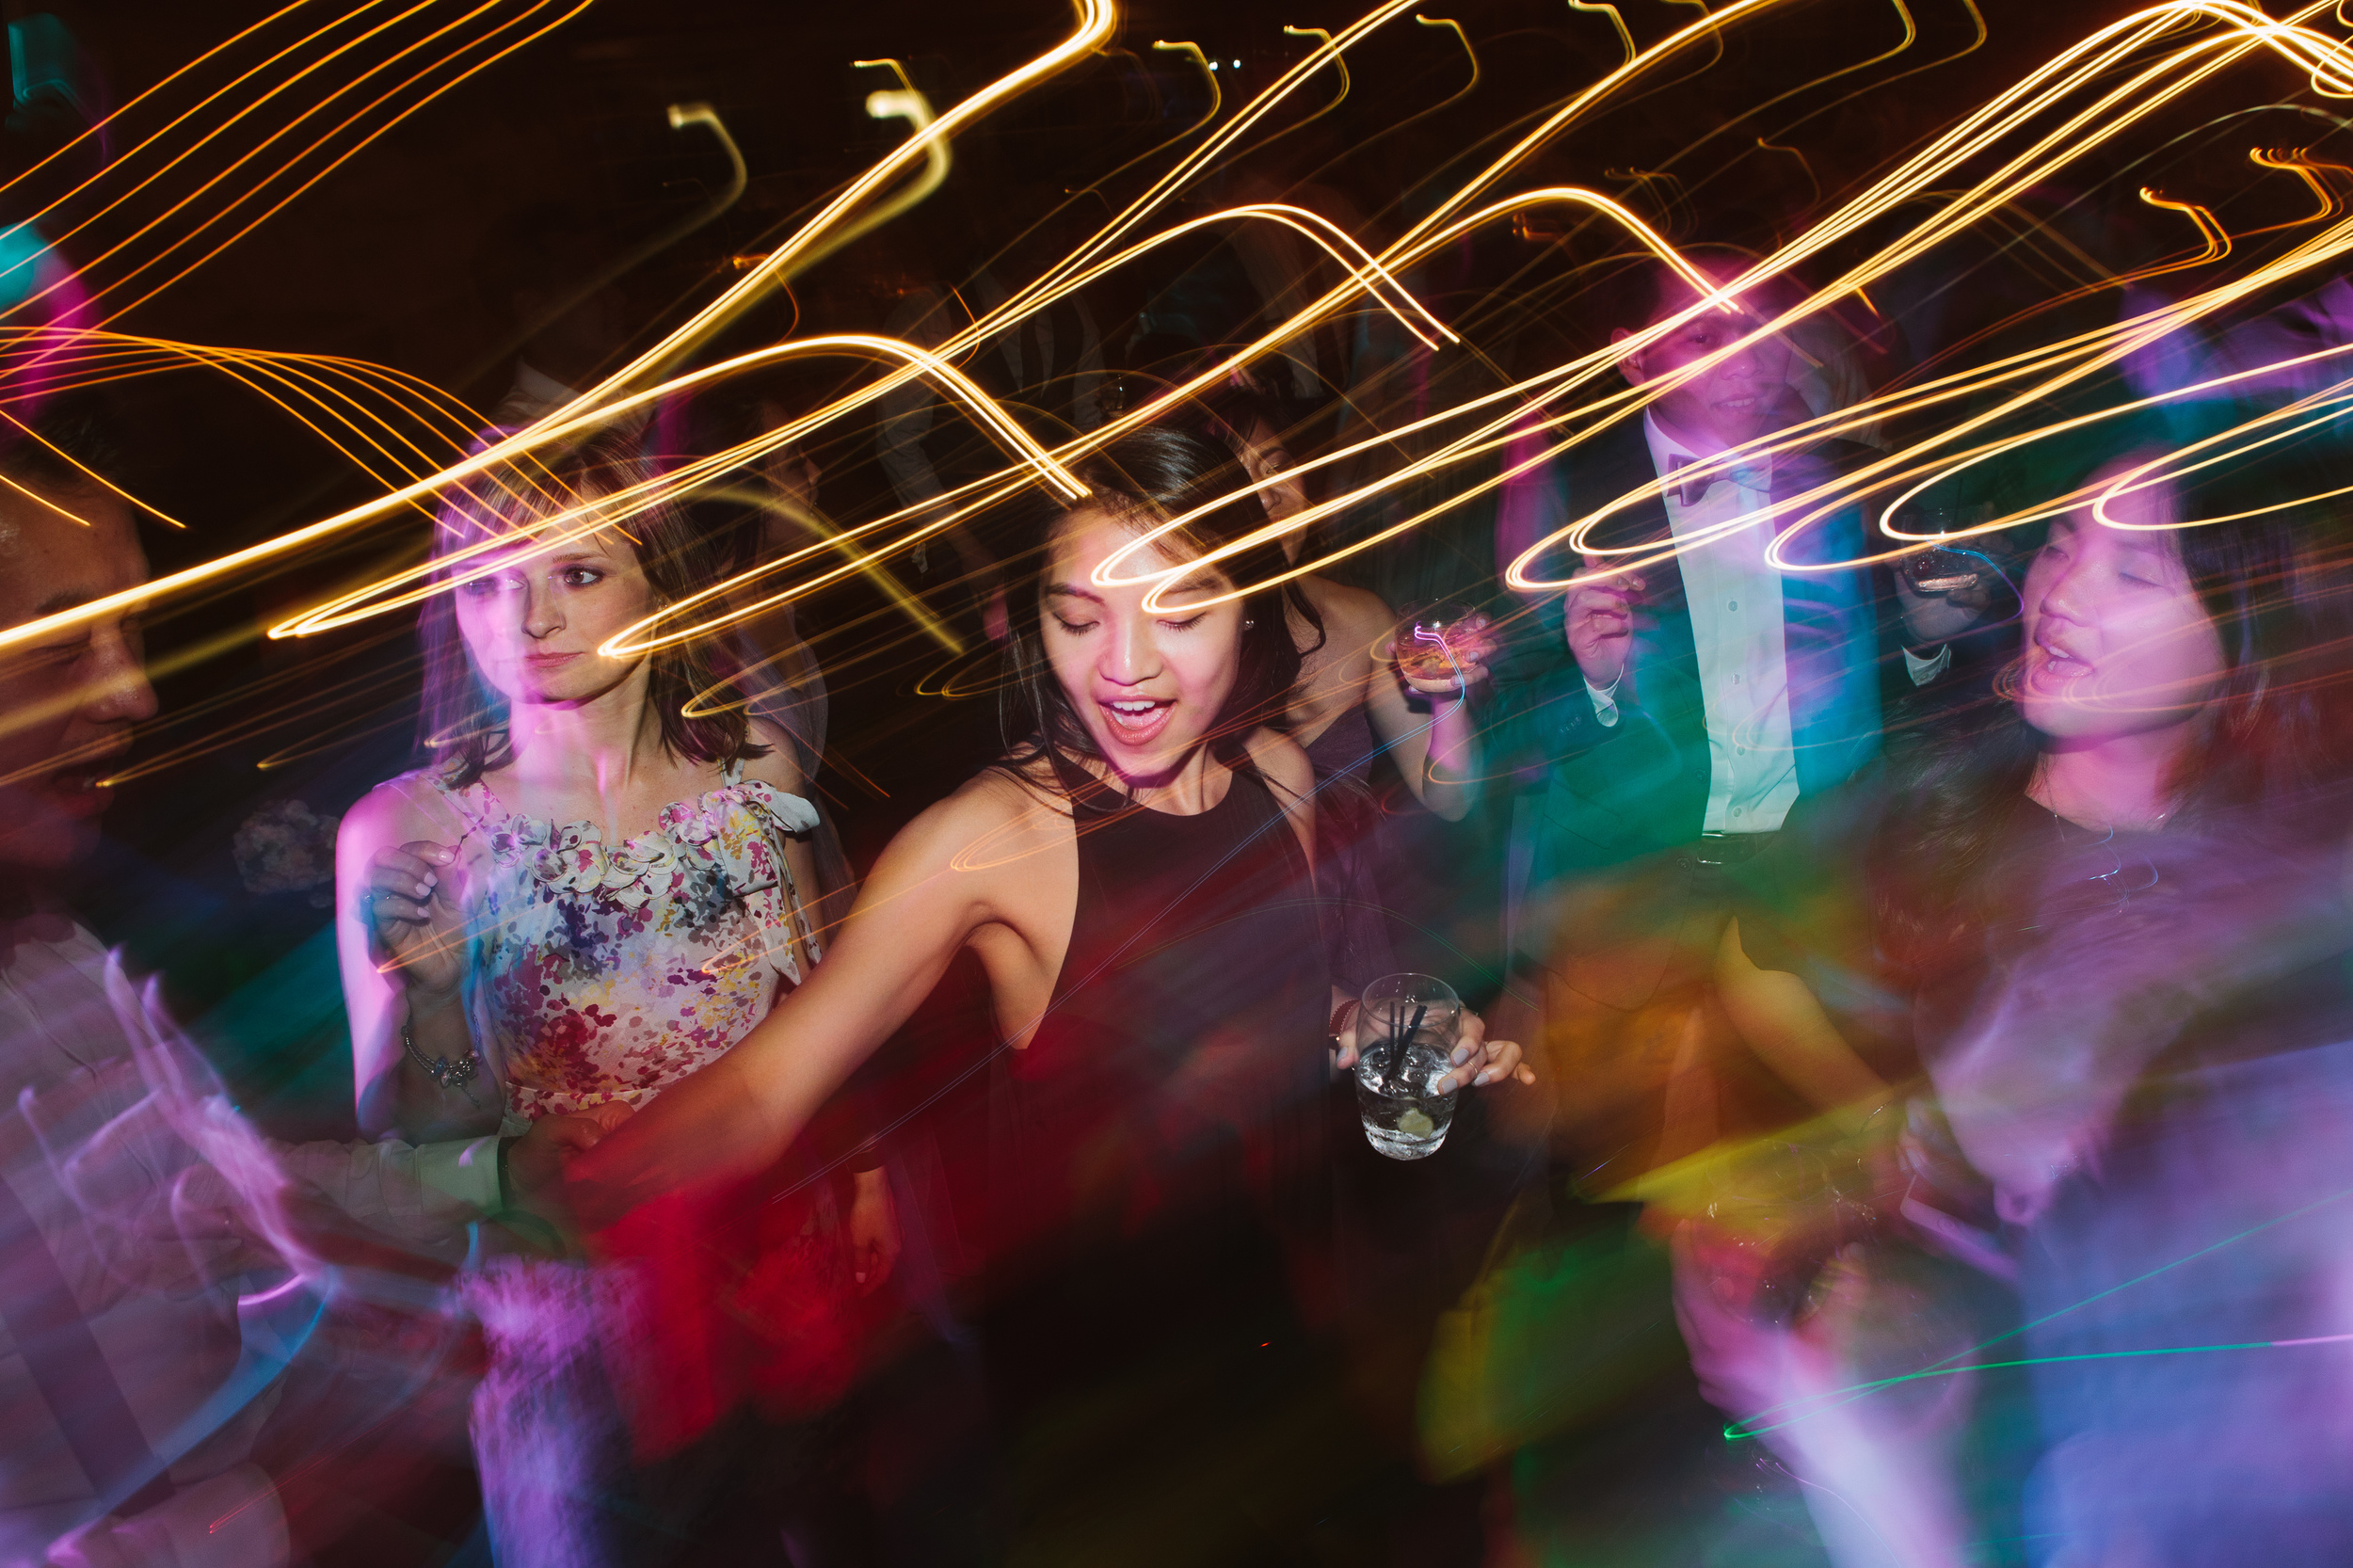 Nicodem Creative_Blog_Leung Wedding_The Pavilion at Orchad Ridge Farms_Rockton Illinois-73.jpg